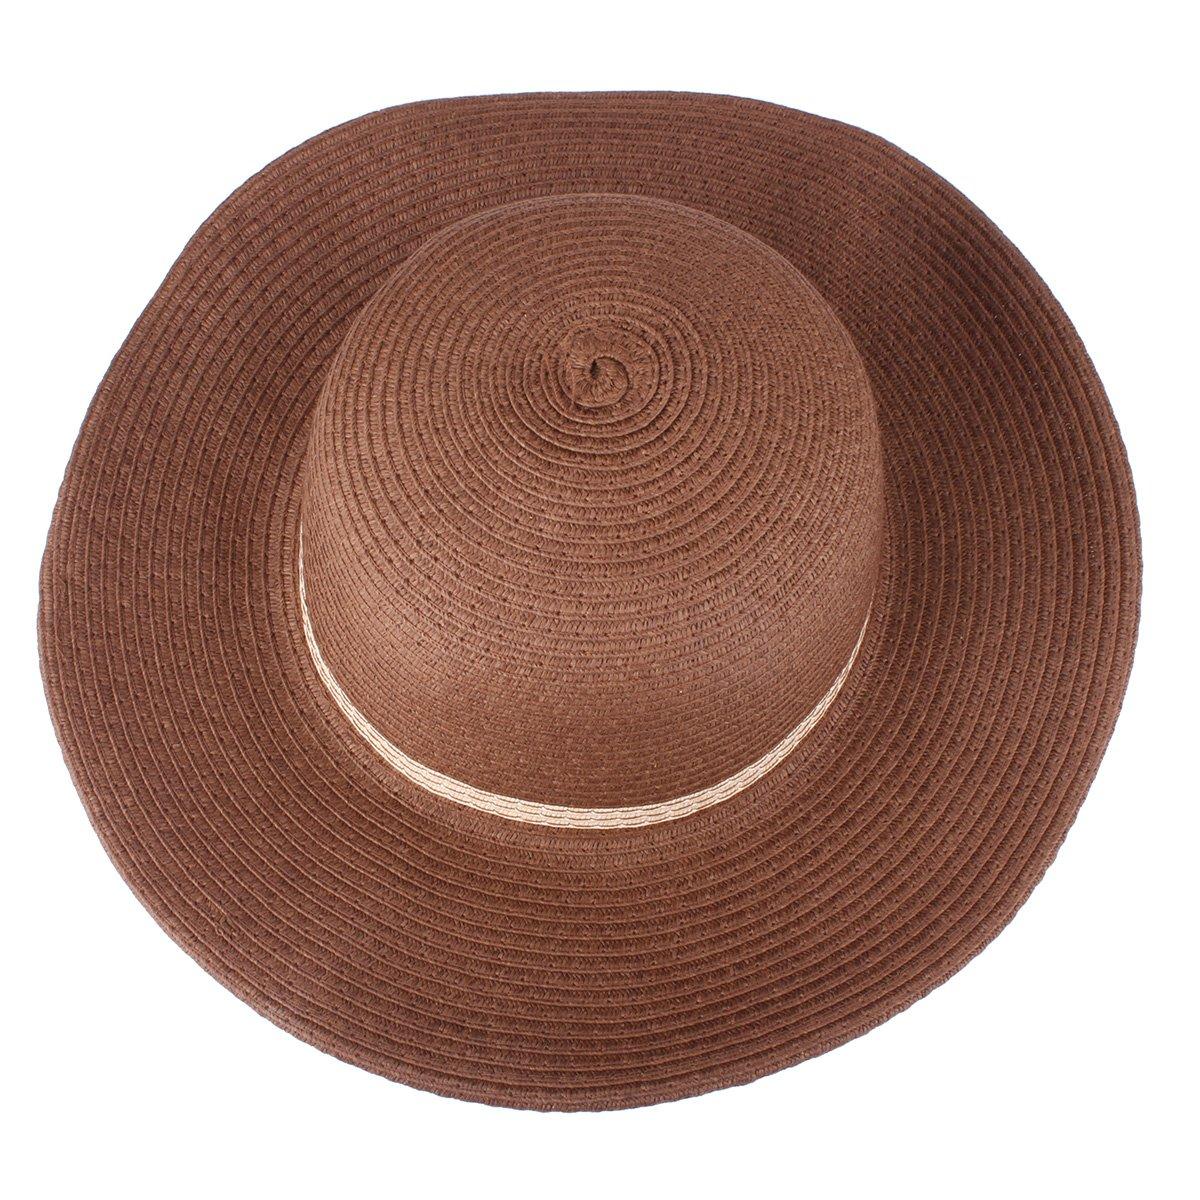 4b6997a1175b Sun Protection Sun Hats for Kids Girls Sun Hat Summer Straw Hat Beach  Floppy Cap with Handbag ...